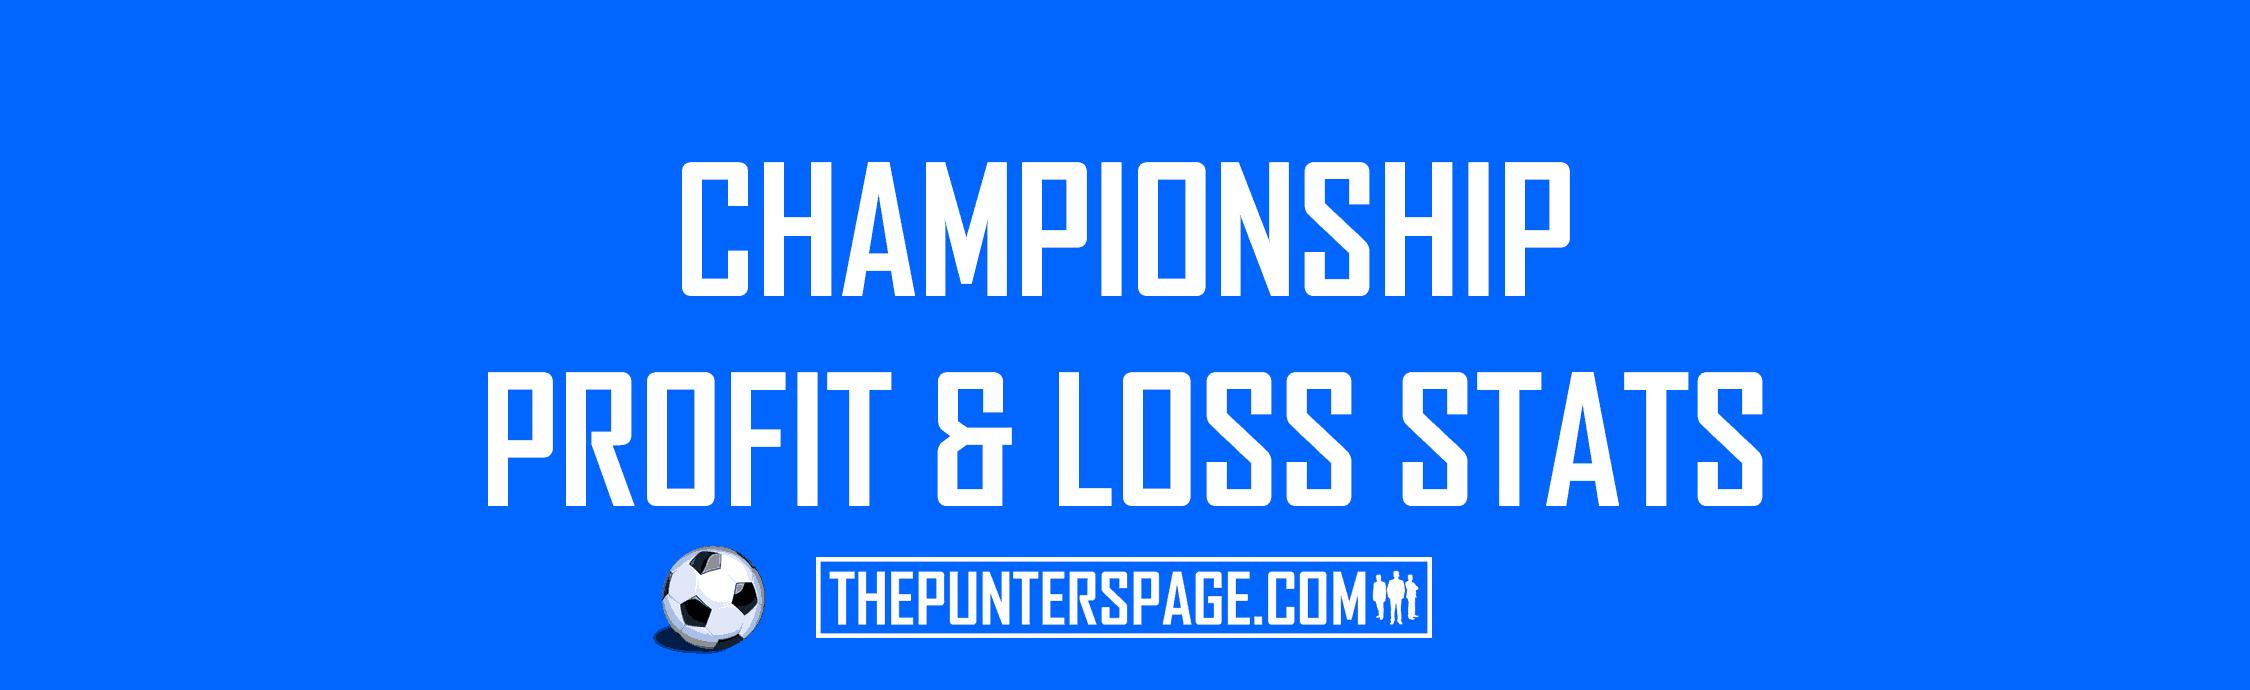 Championship Profit & Loss Statistics